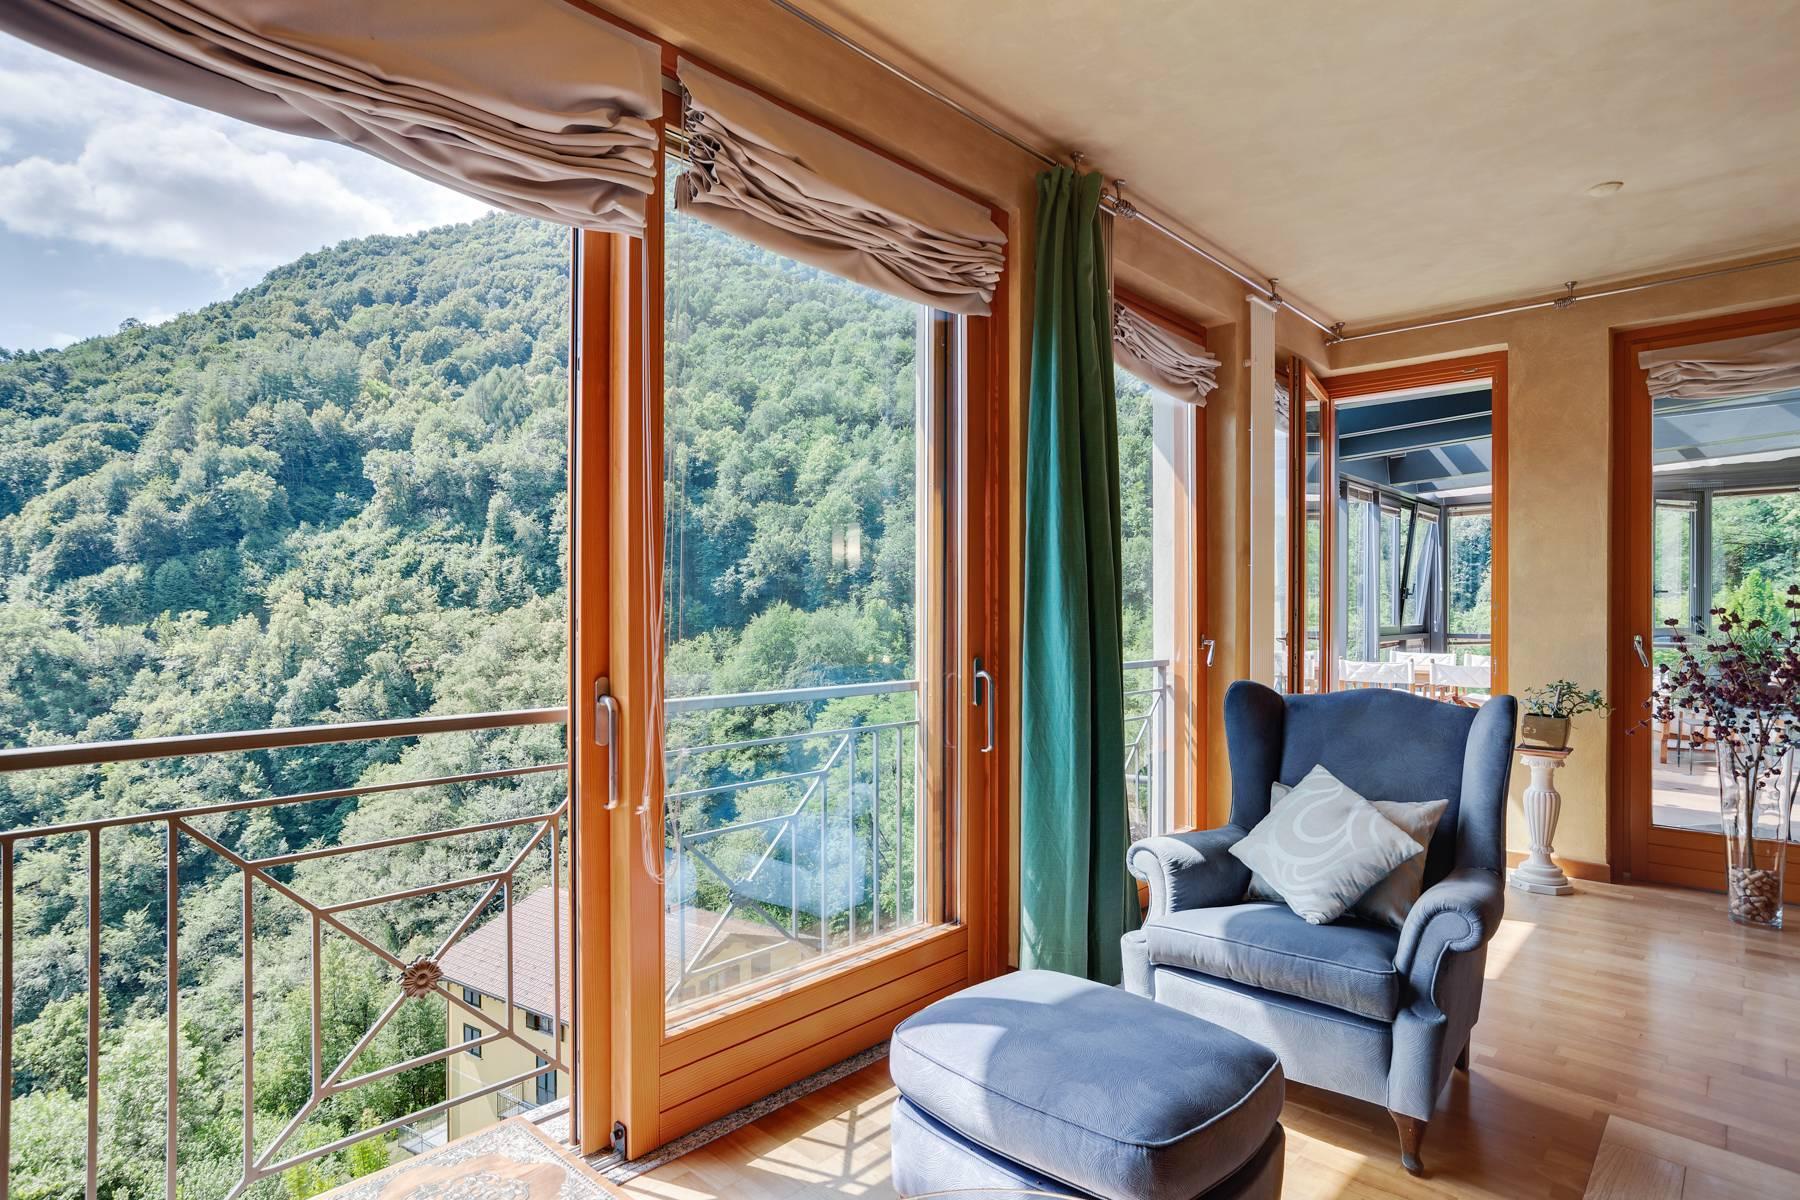 Splendida villa moderna sulla collina soleggiata sopra Argegno - 16